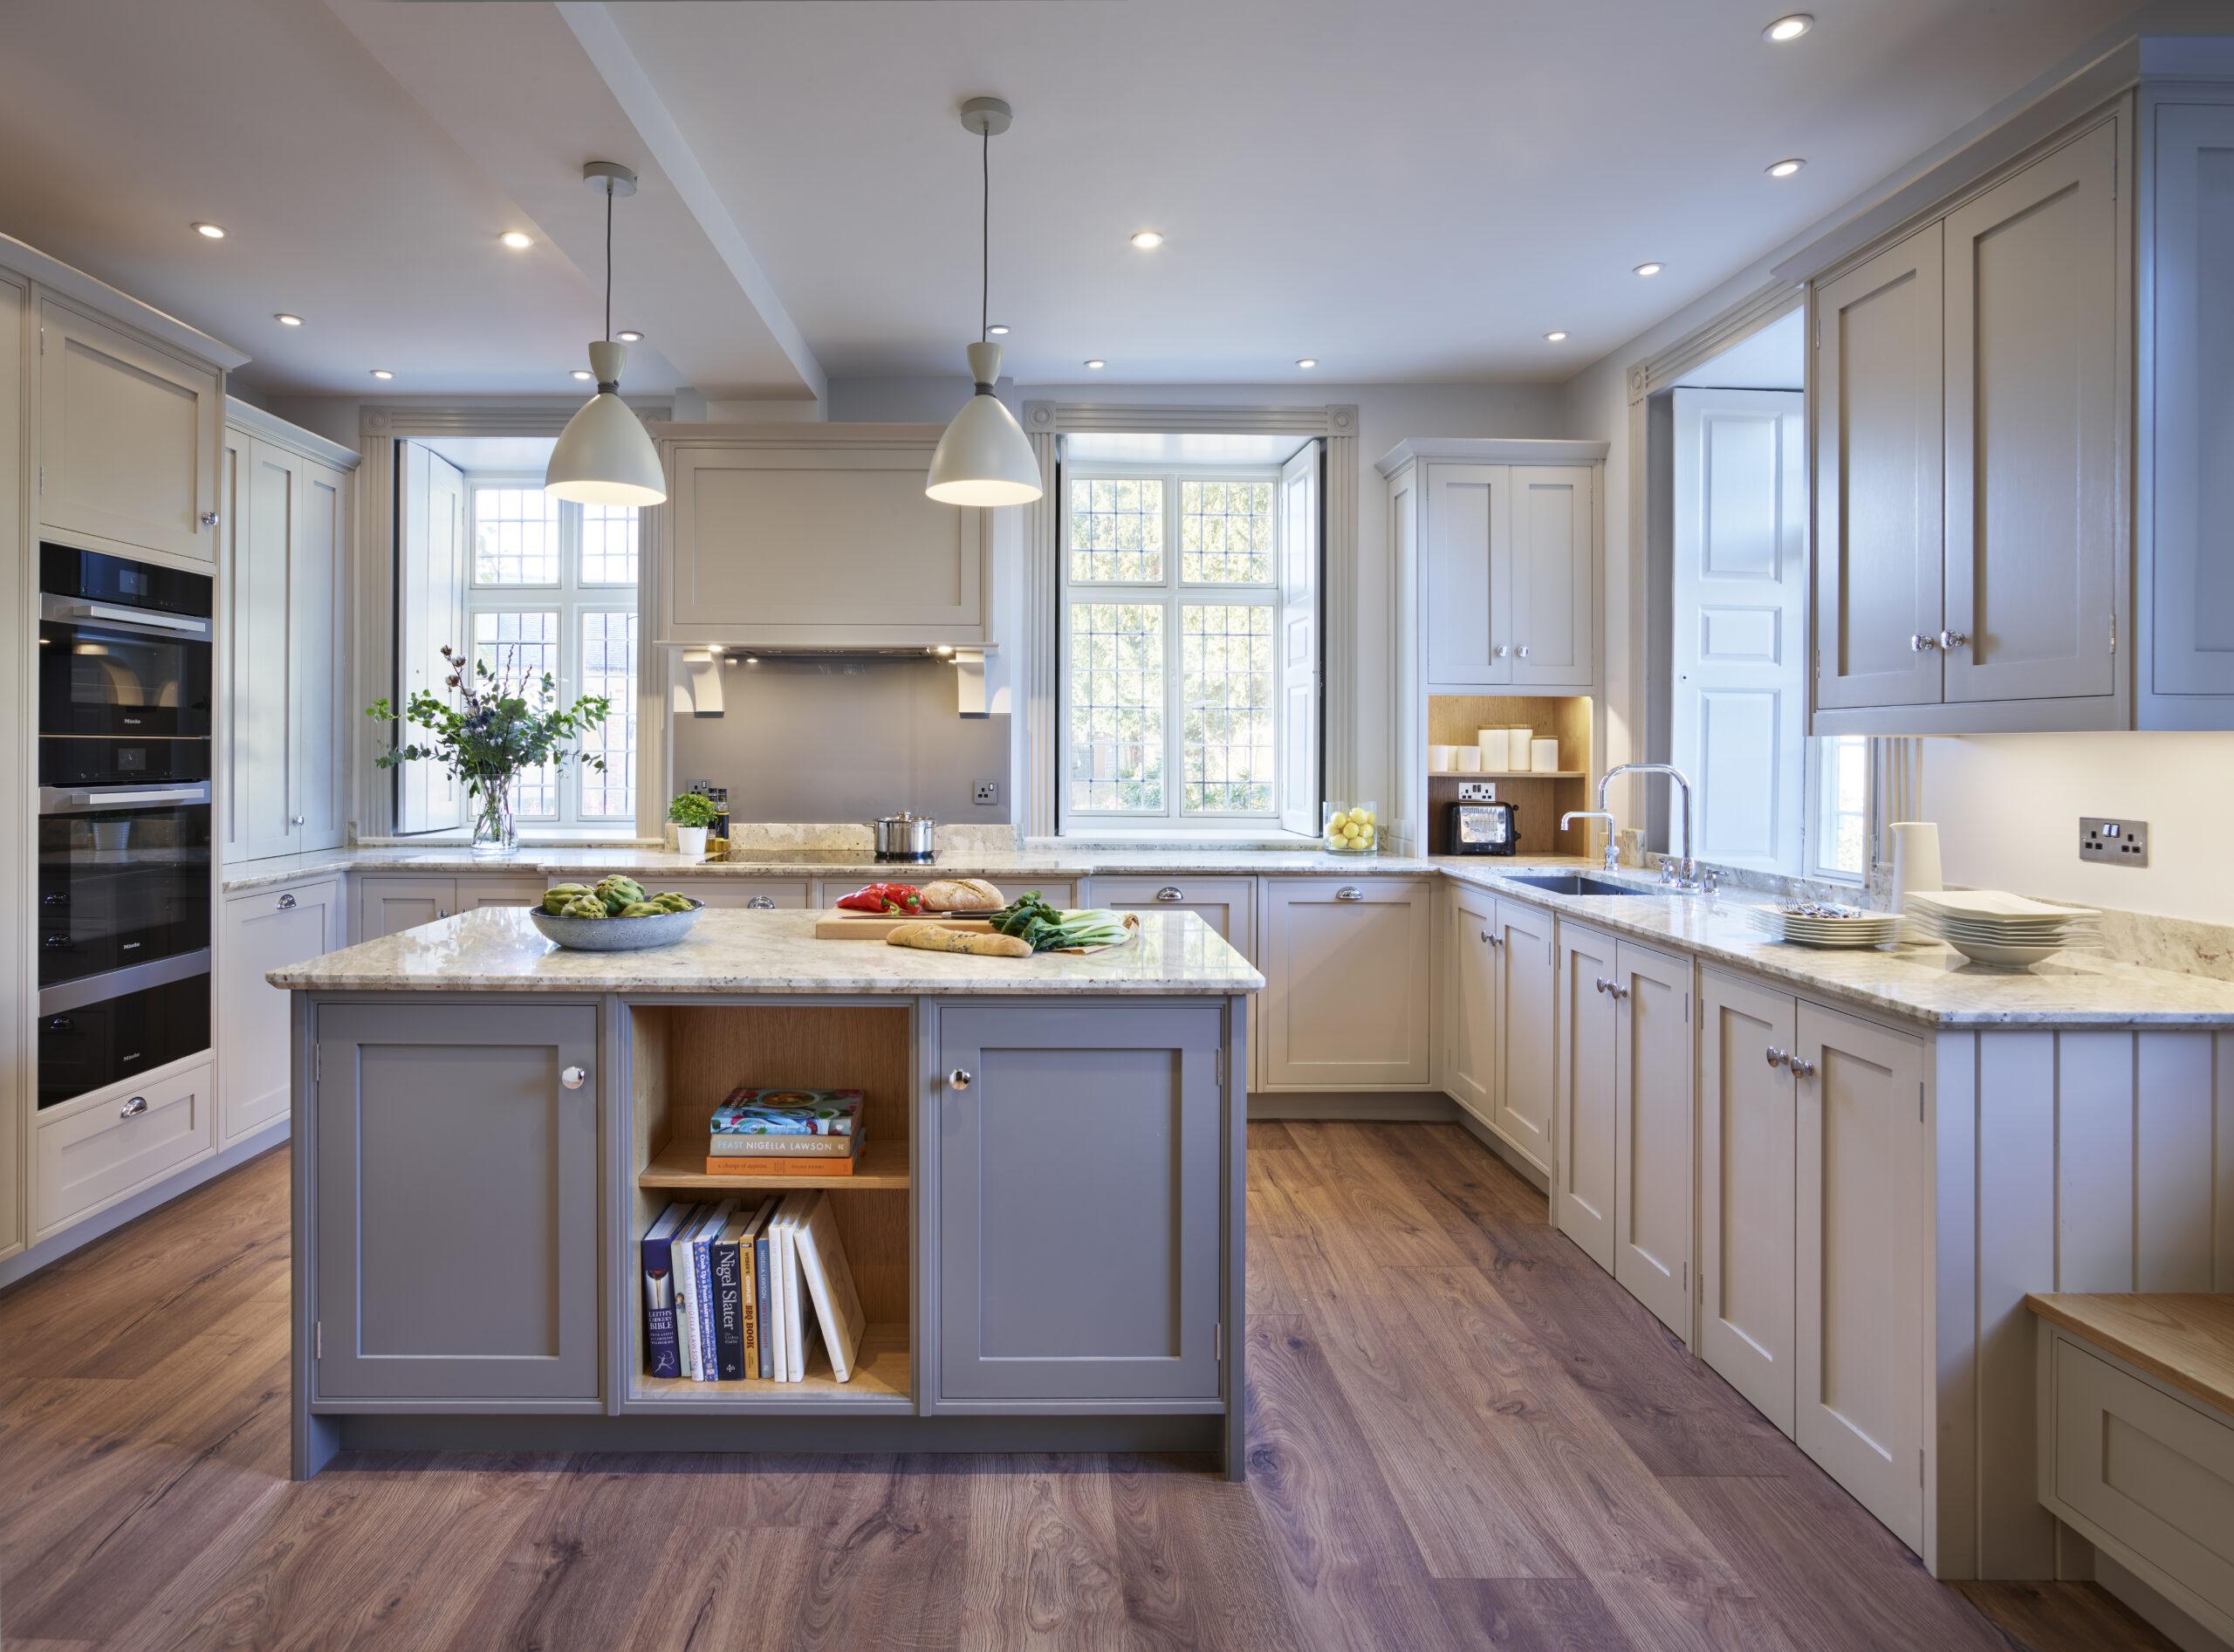 Simon Taylor Furniture - Aylesbury Vale - Kitchen Island